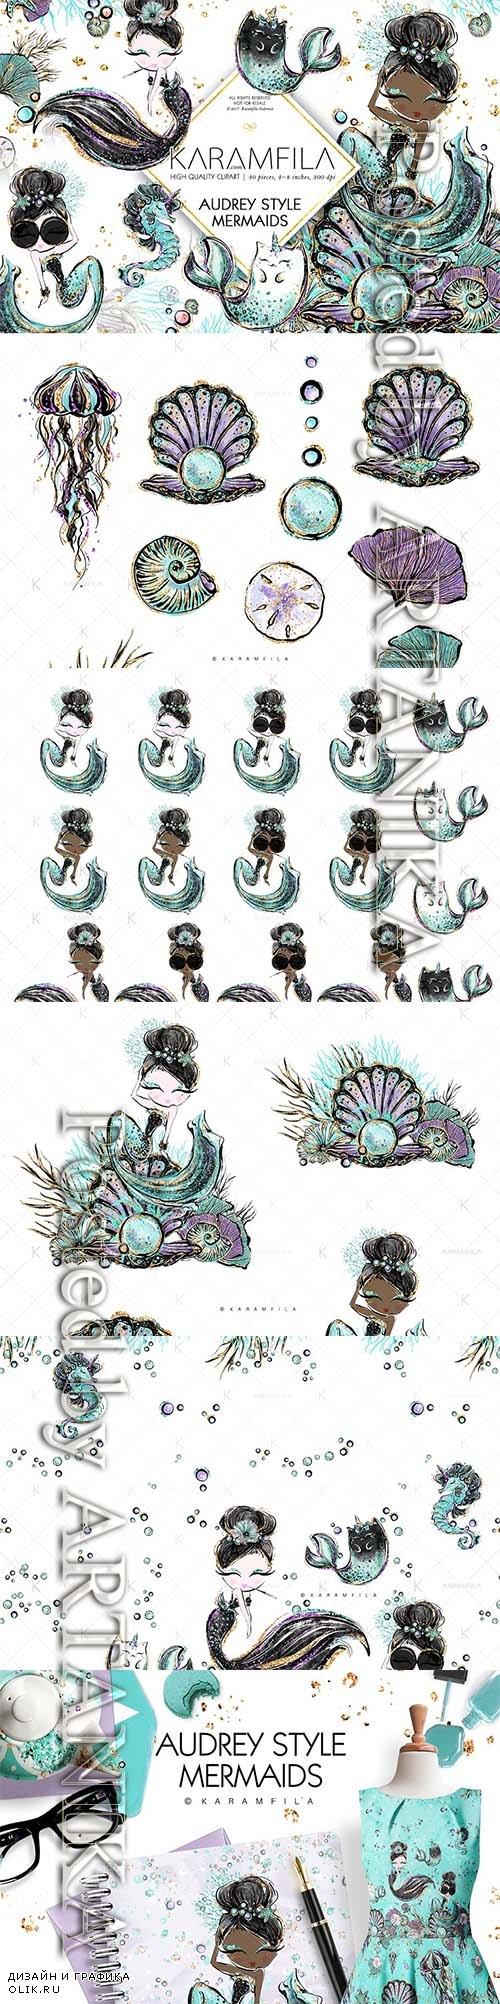 CreativeMarket - Audrey Hepburn Style Mermaids 2218733